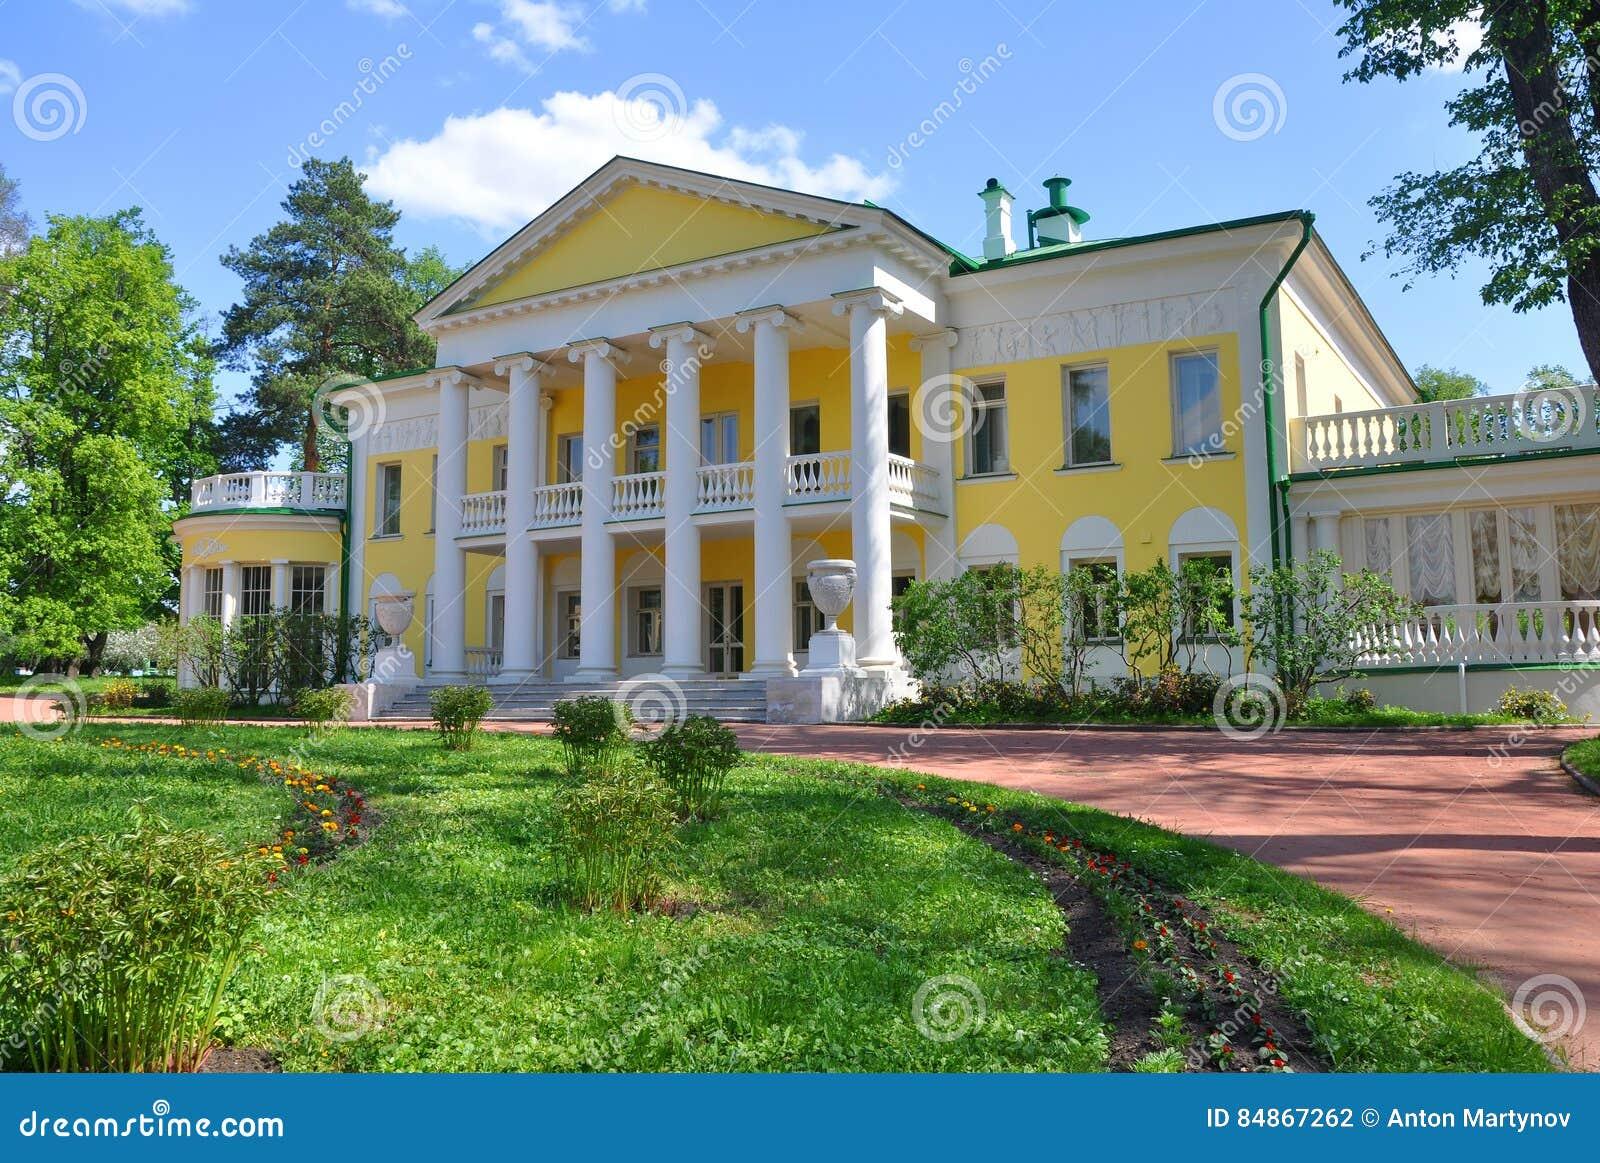 State Museum-Reserve Gorki Leninskie: photos, address, reviews 45